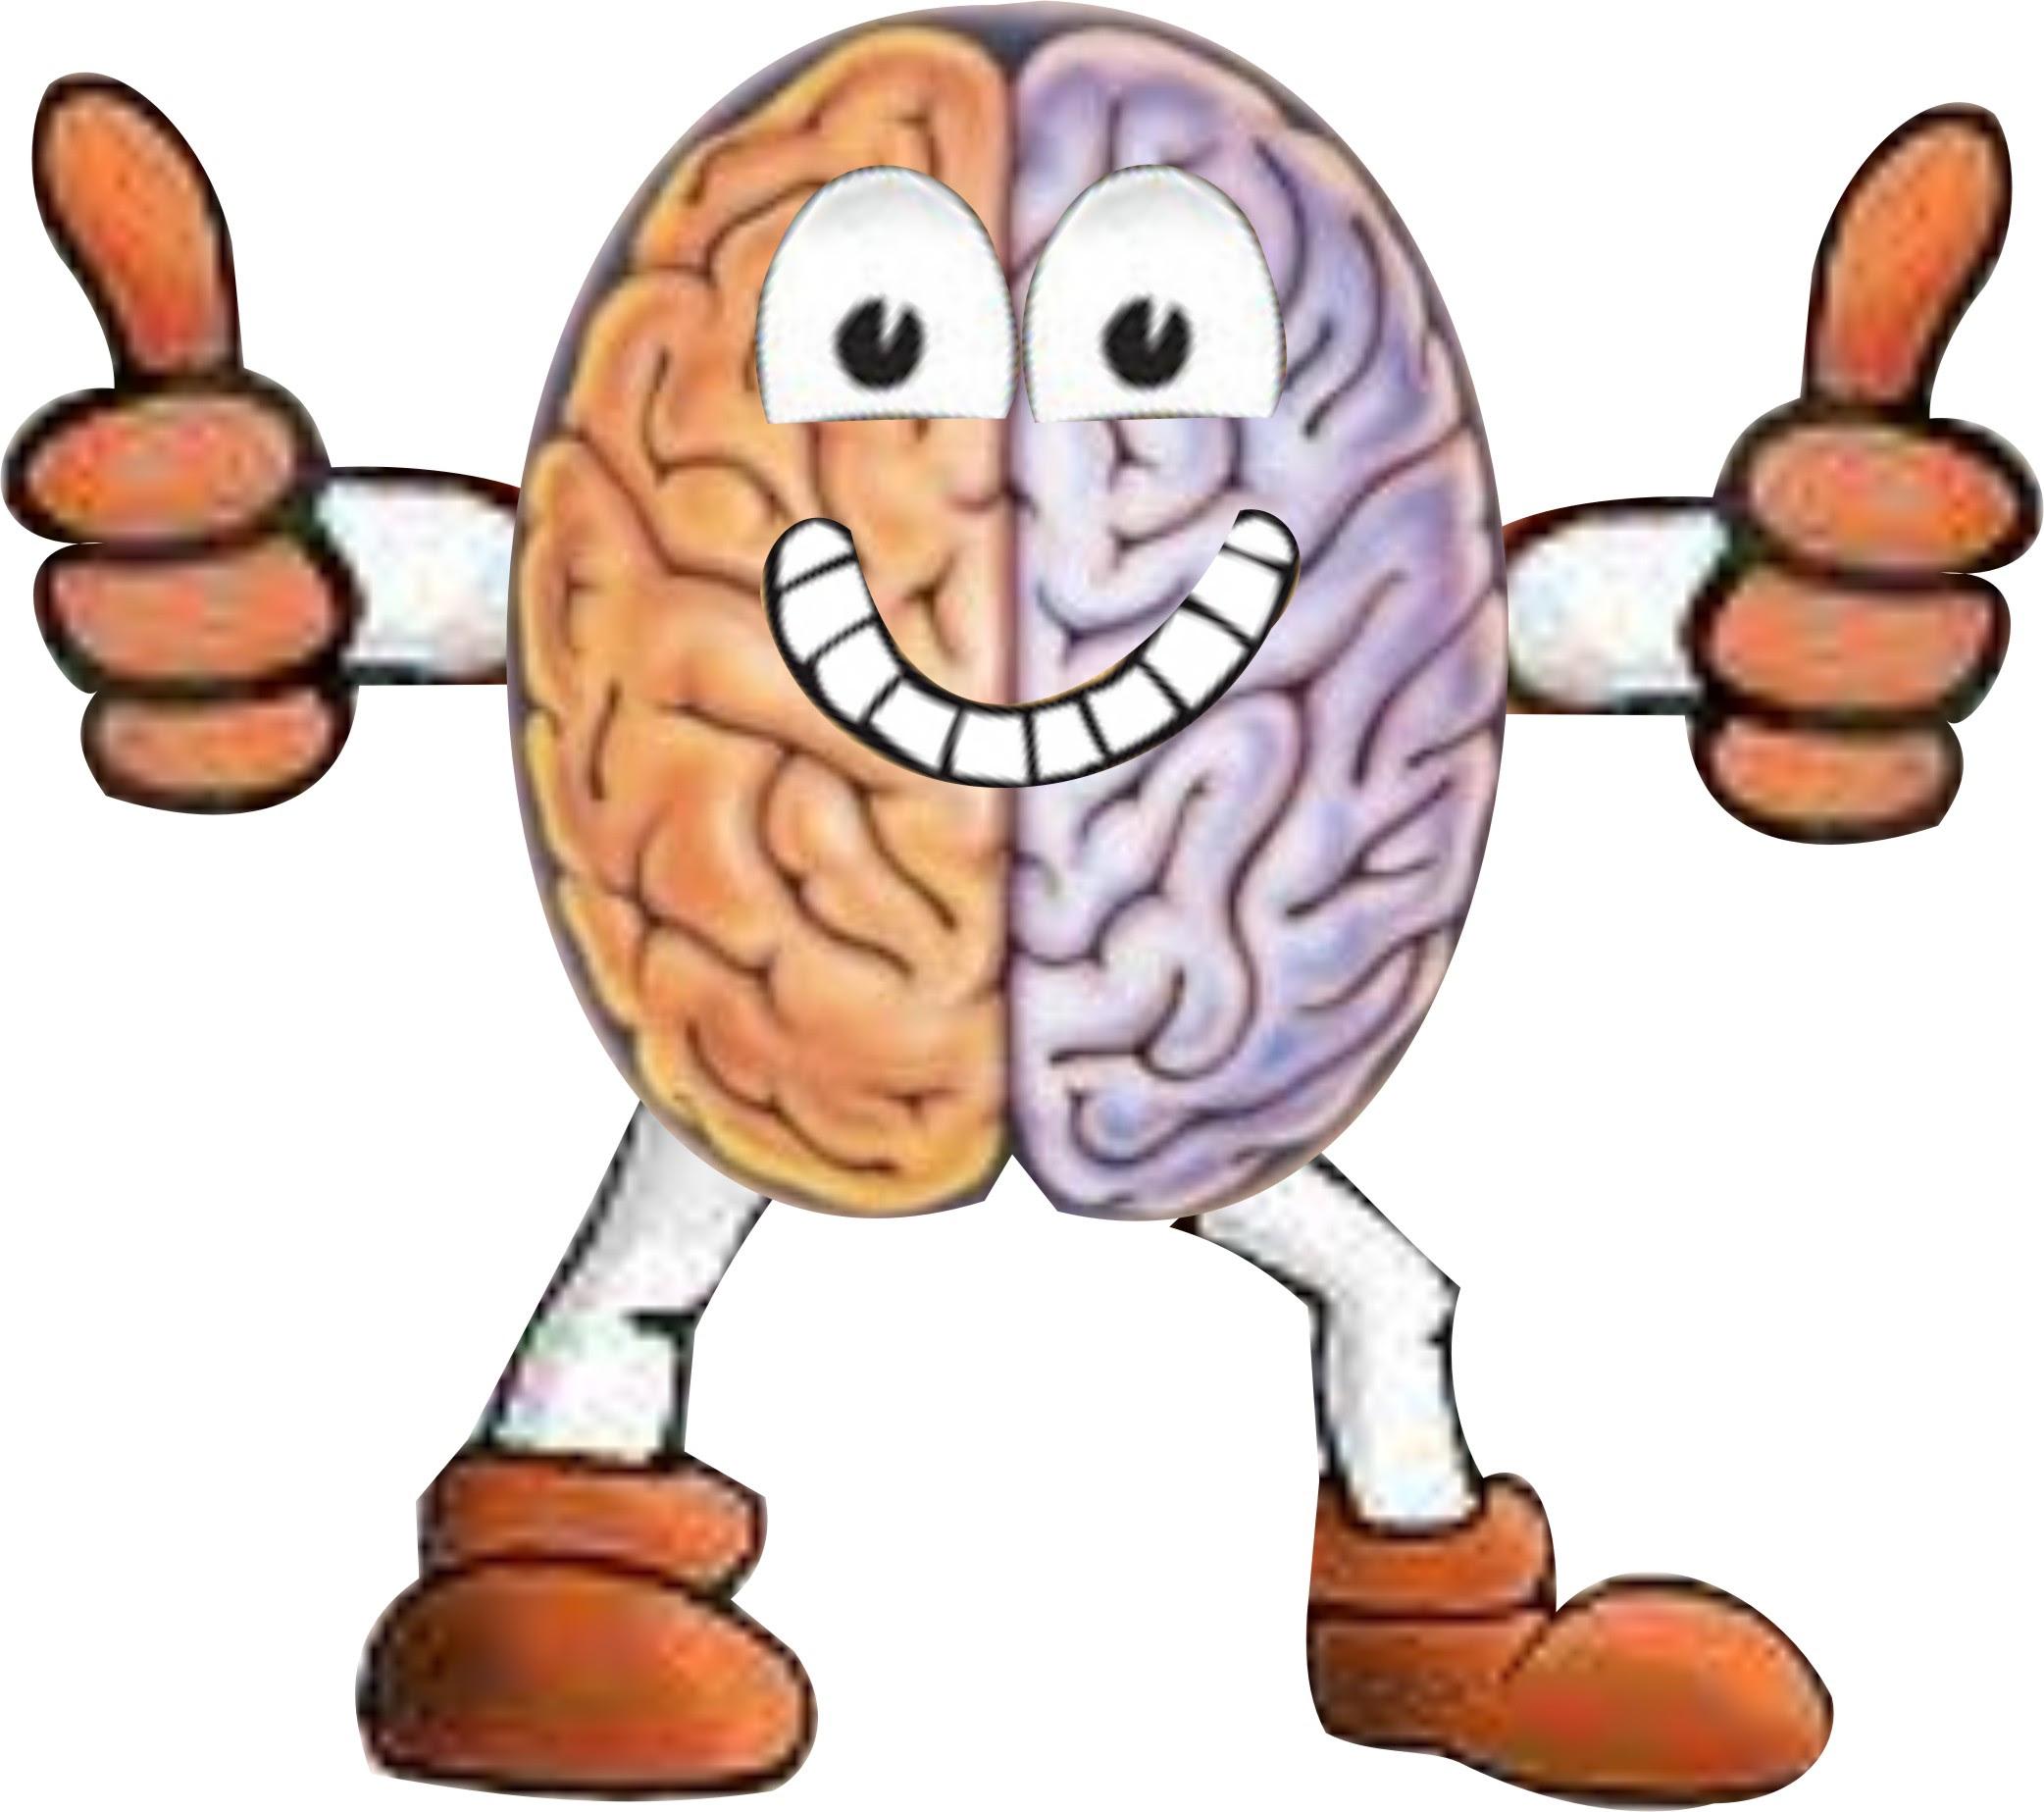 85 Gambar Animasi Otak Lucu Terbaik